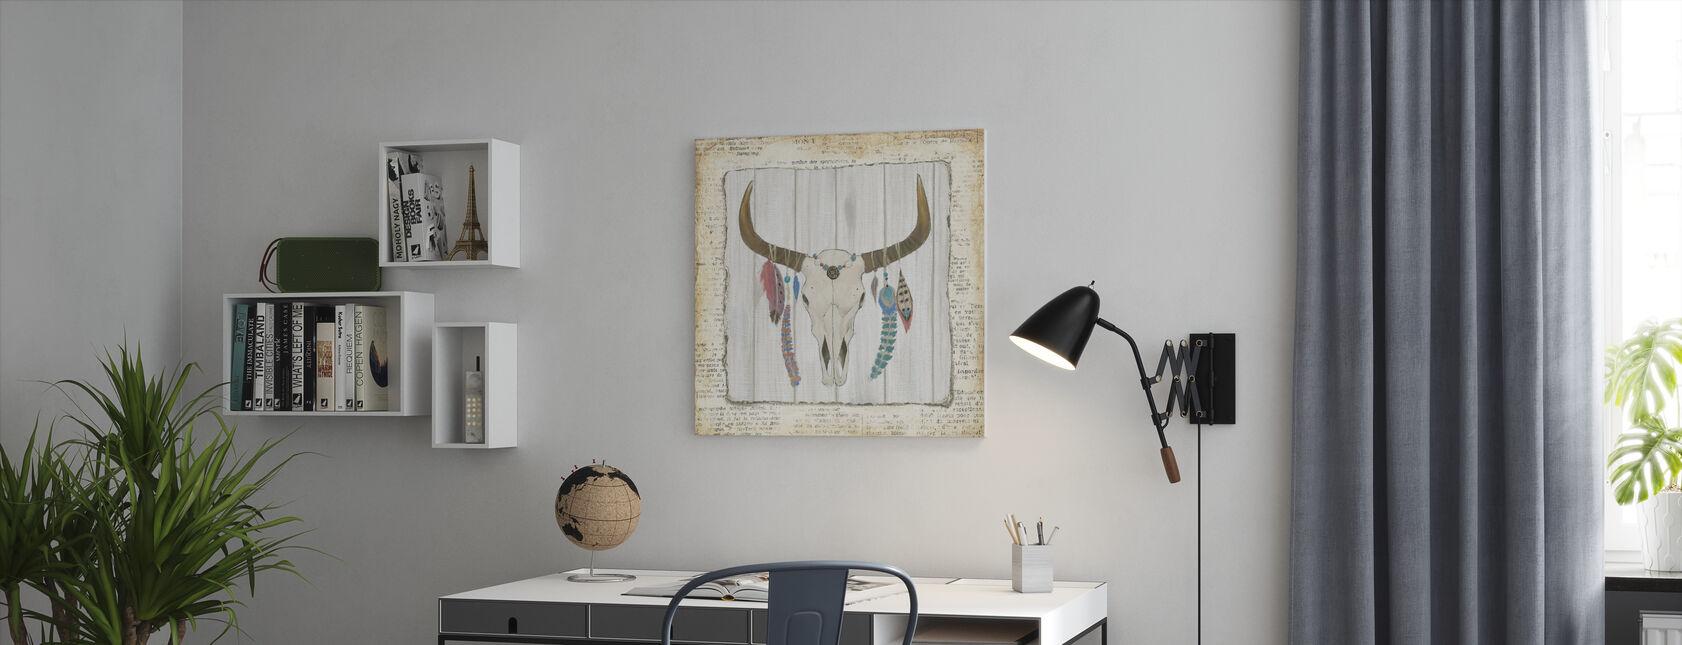 Boheemse rijzende - Canvas print - Kantoor